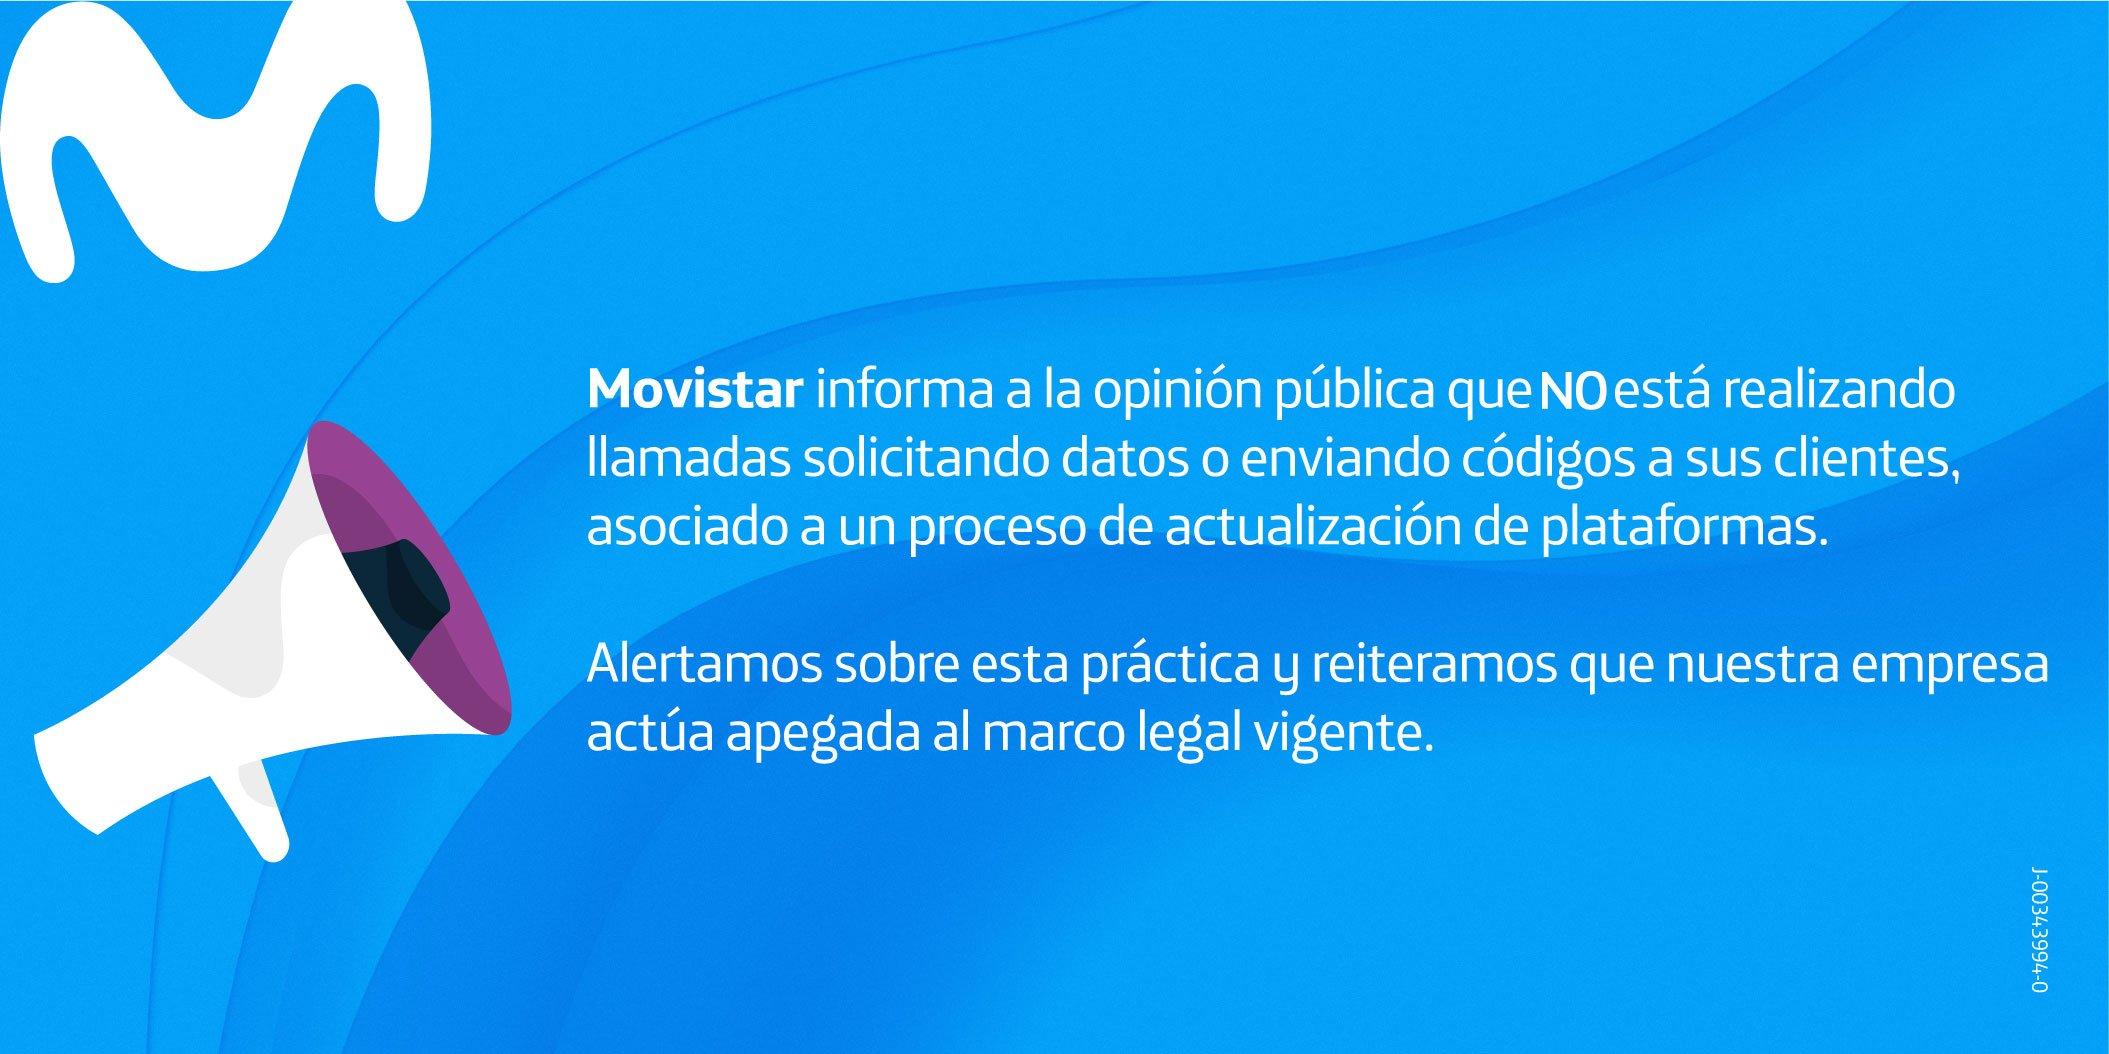 Movistar alerta sobre llamadas fraudulentas a sus clientes